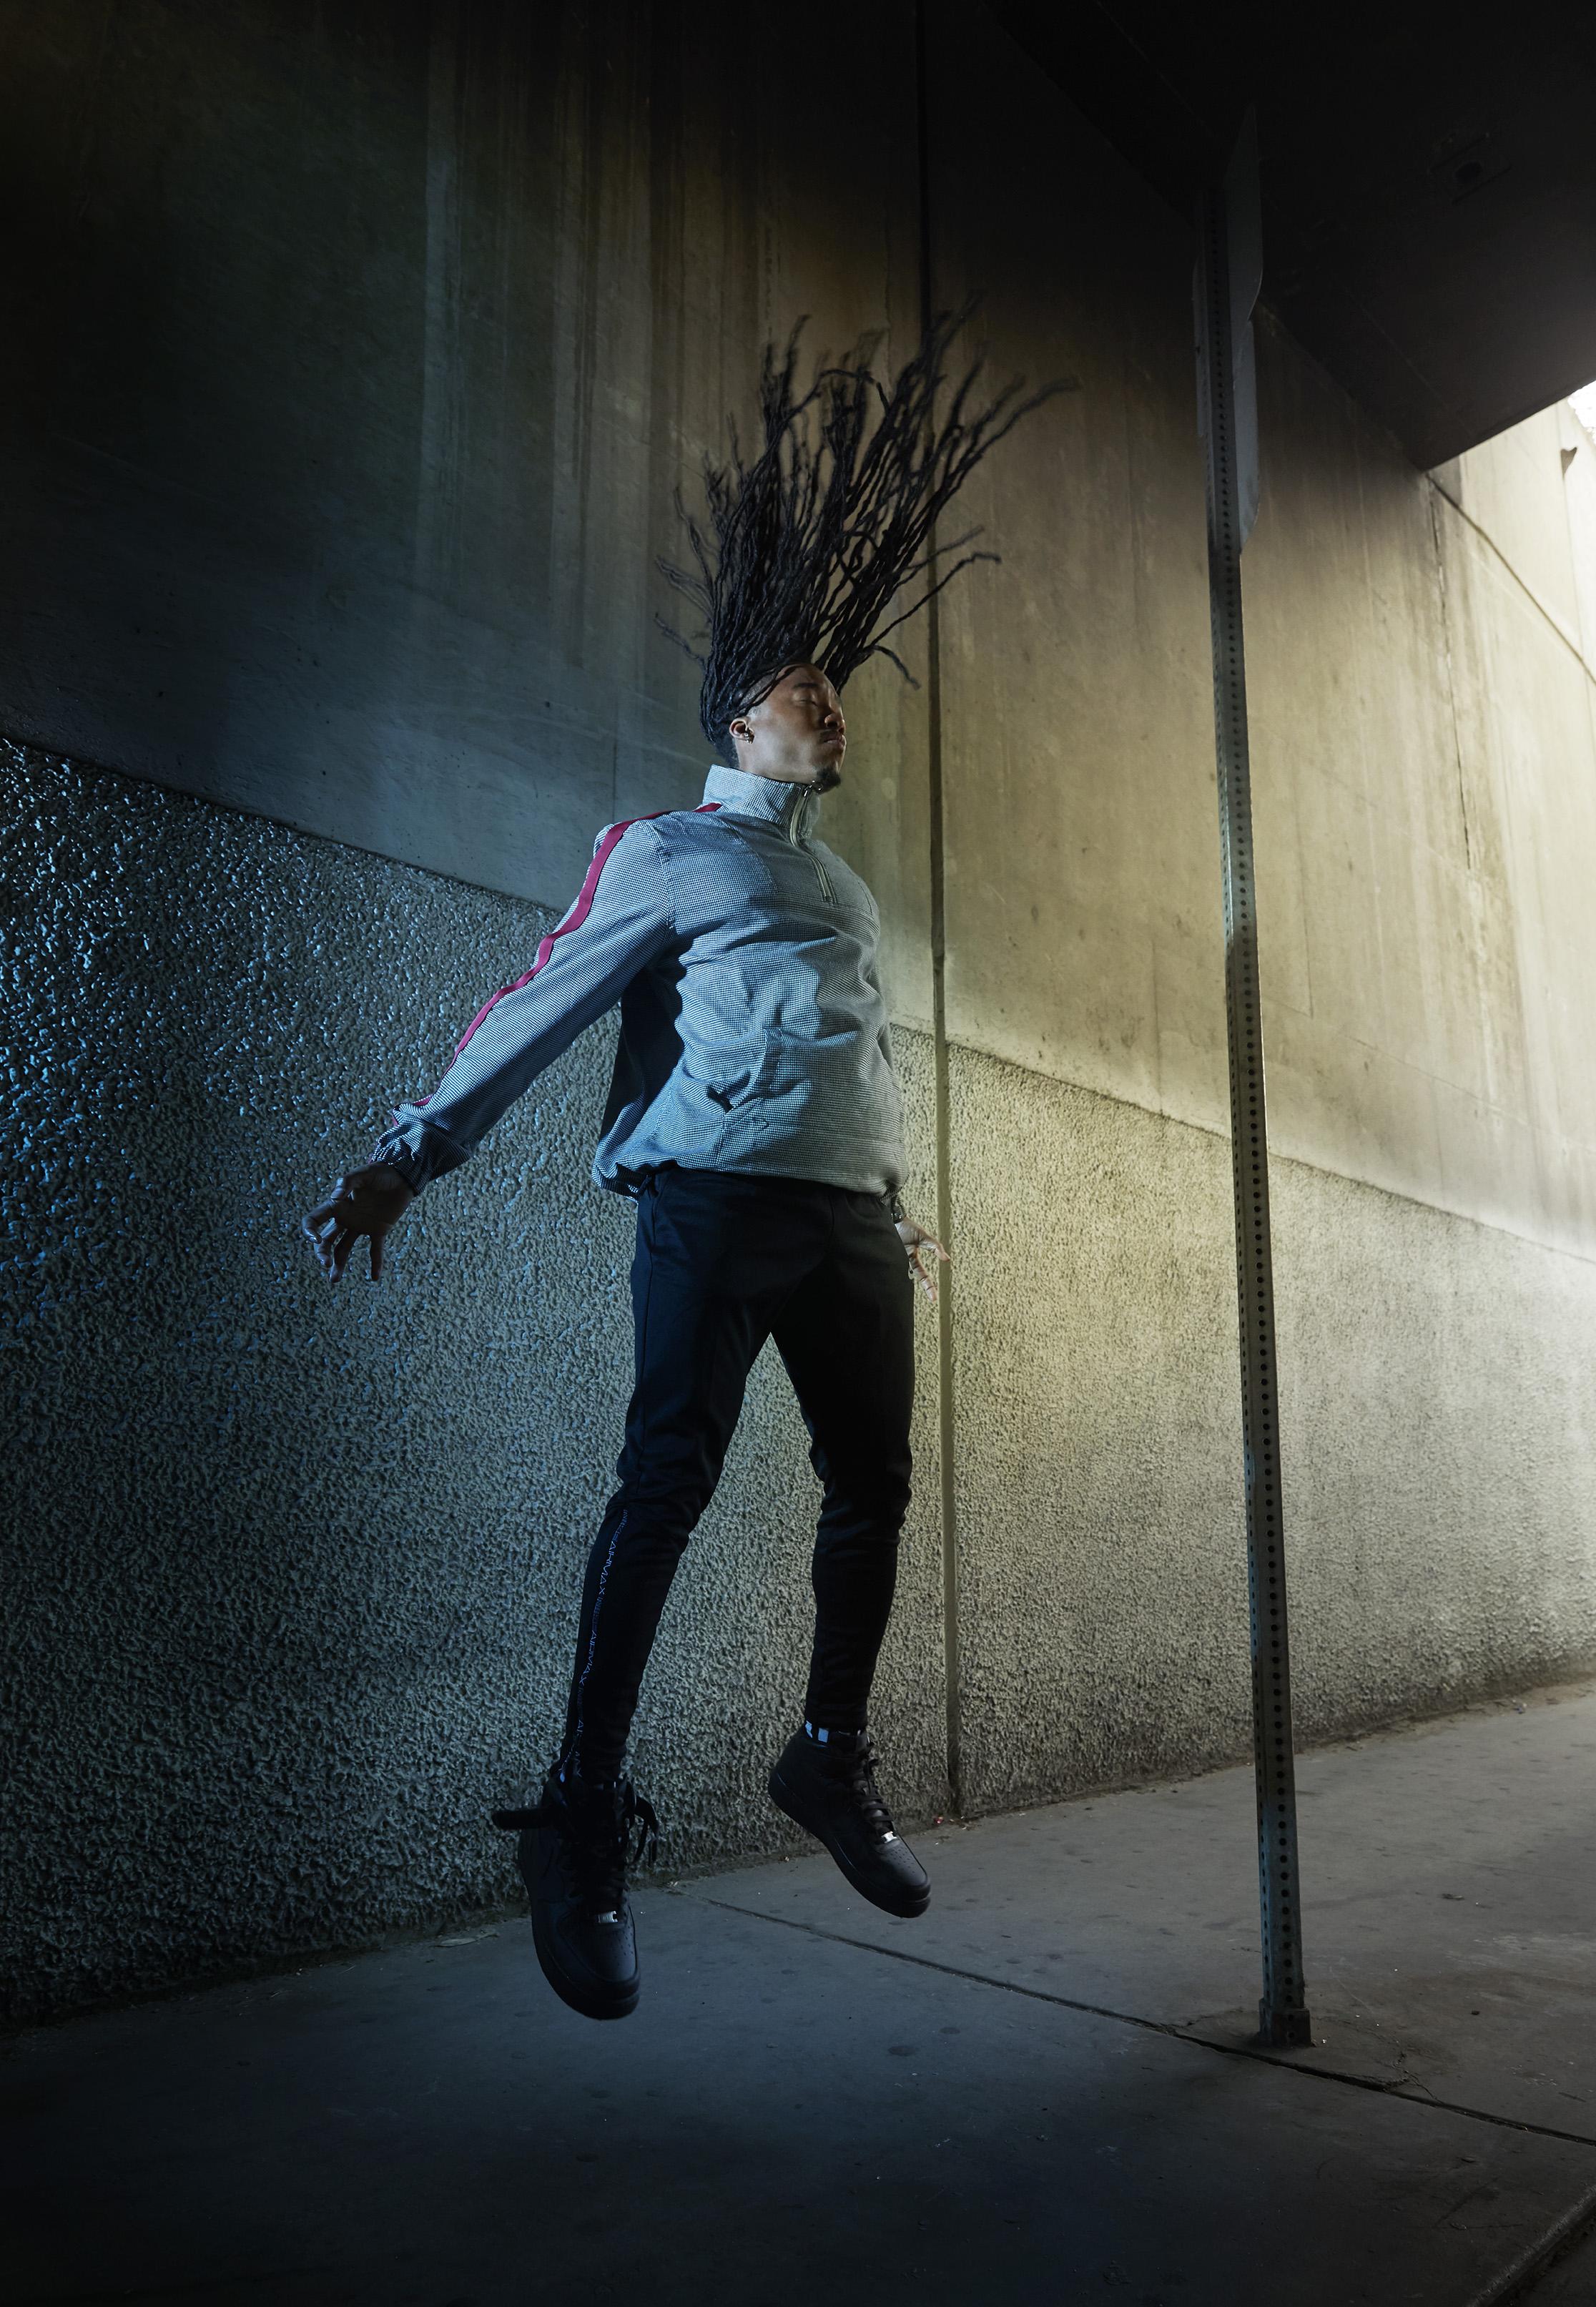 Nike-Location_0493.jpg